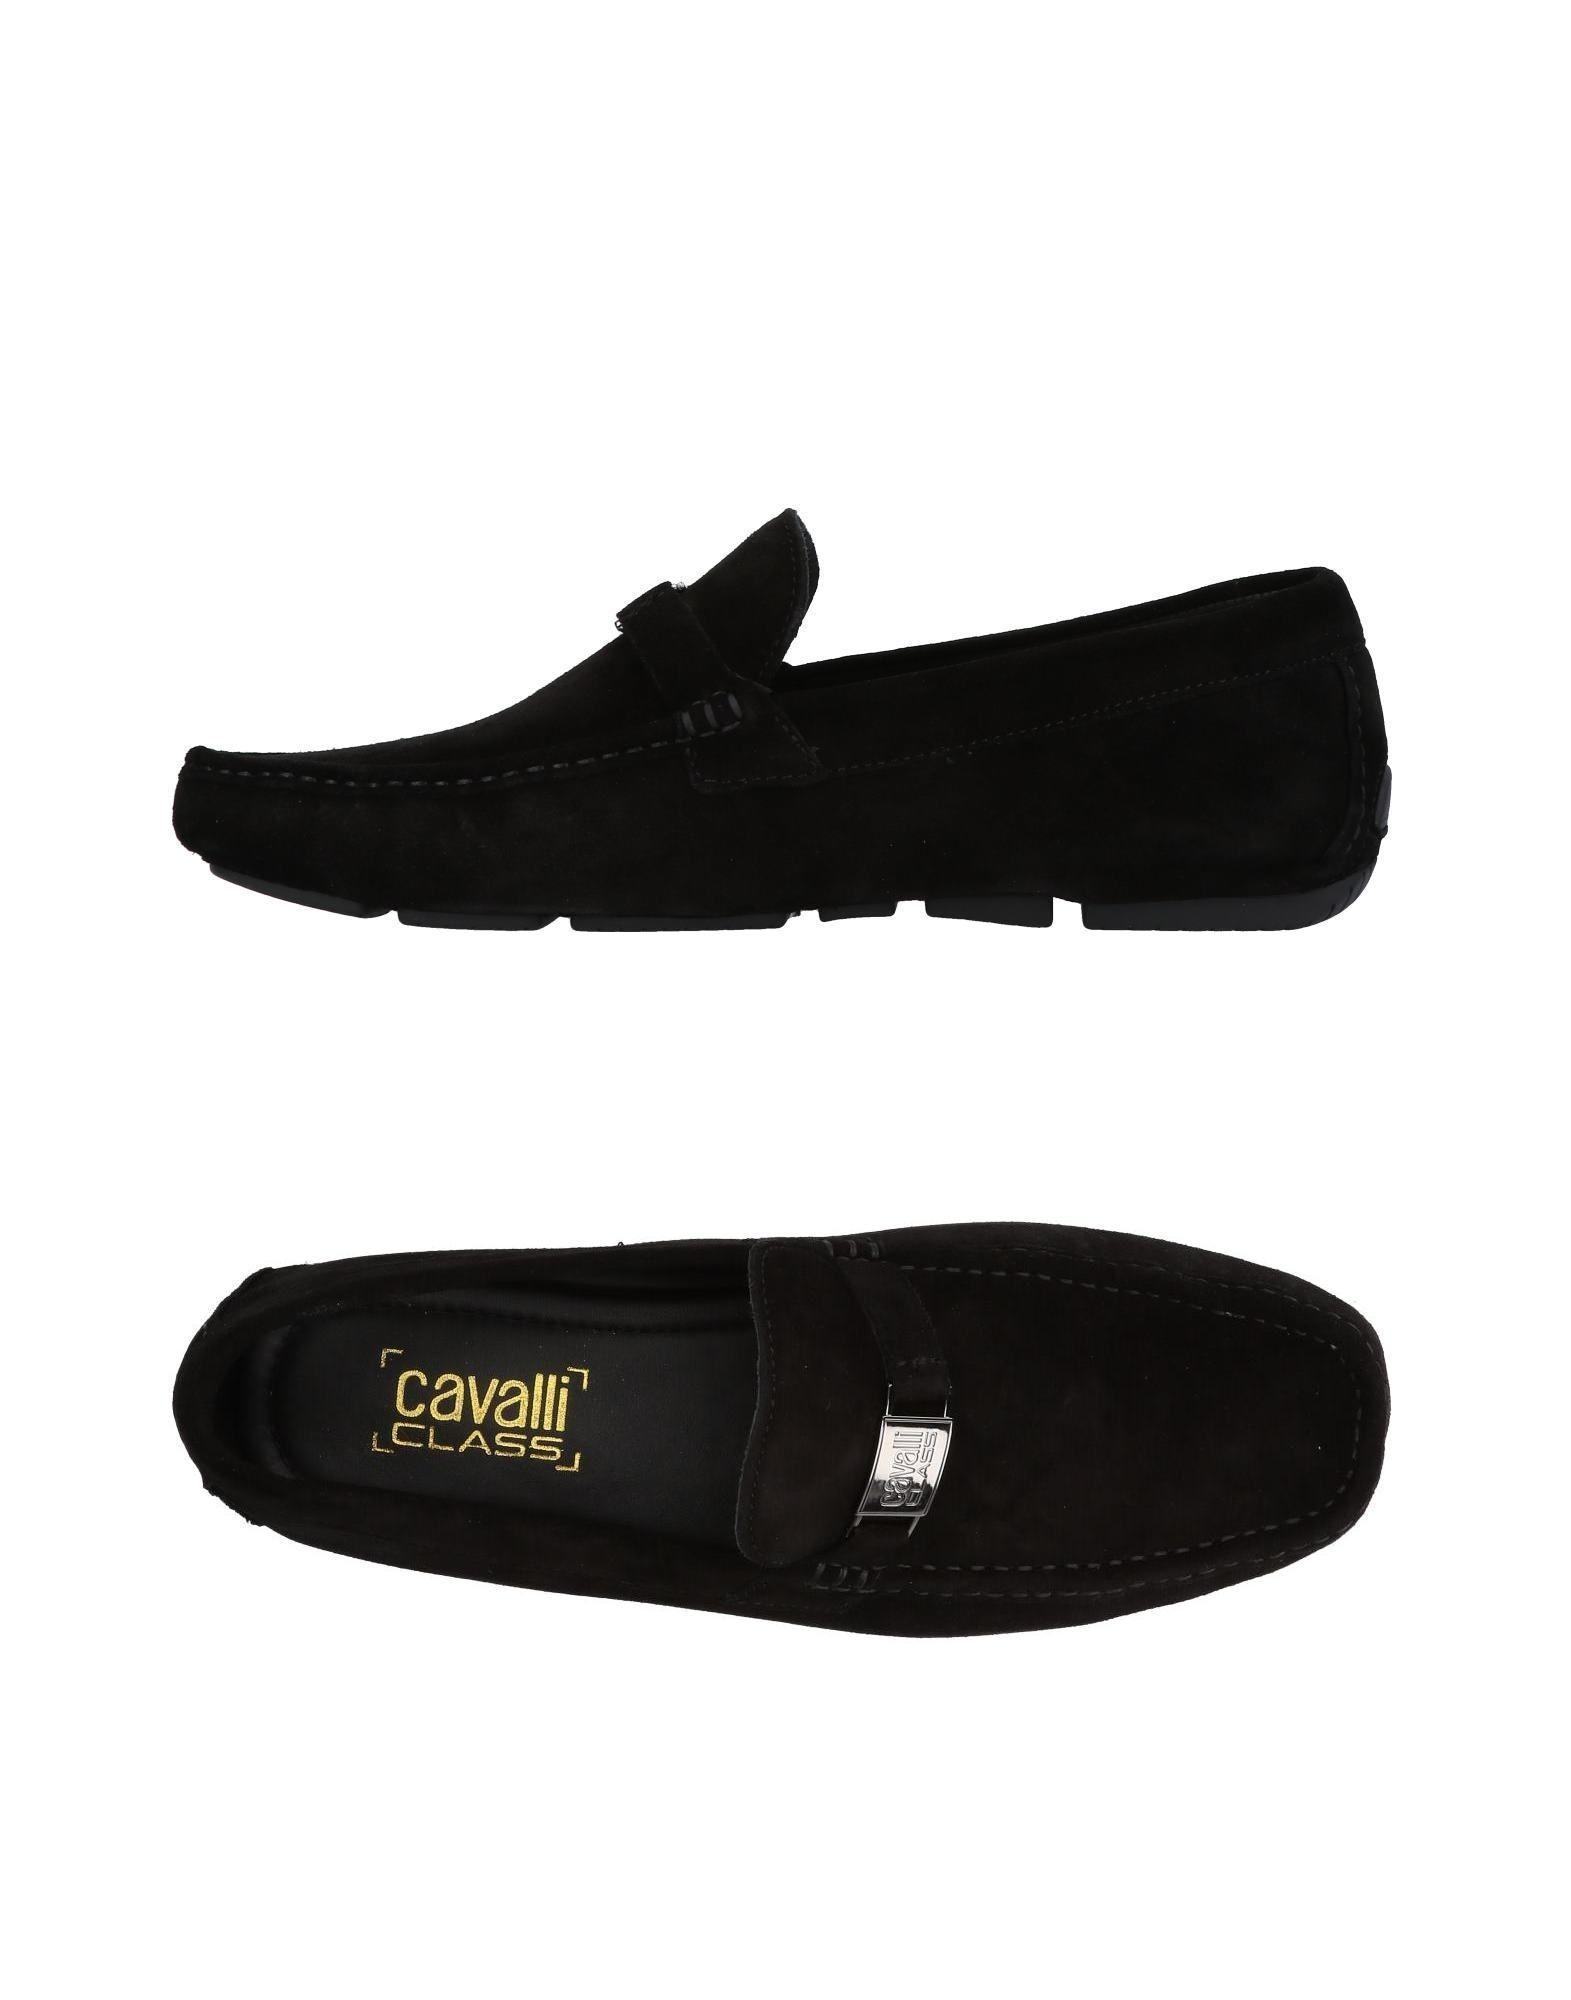 Class Roberto Cavalli Loafers In Black